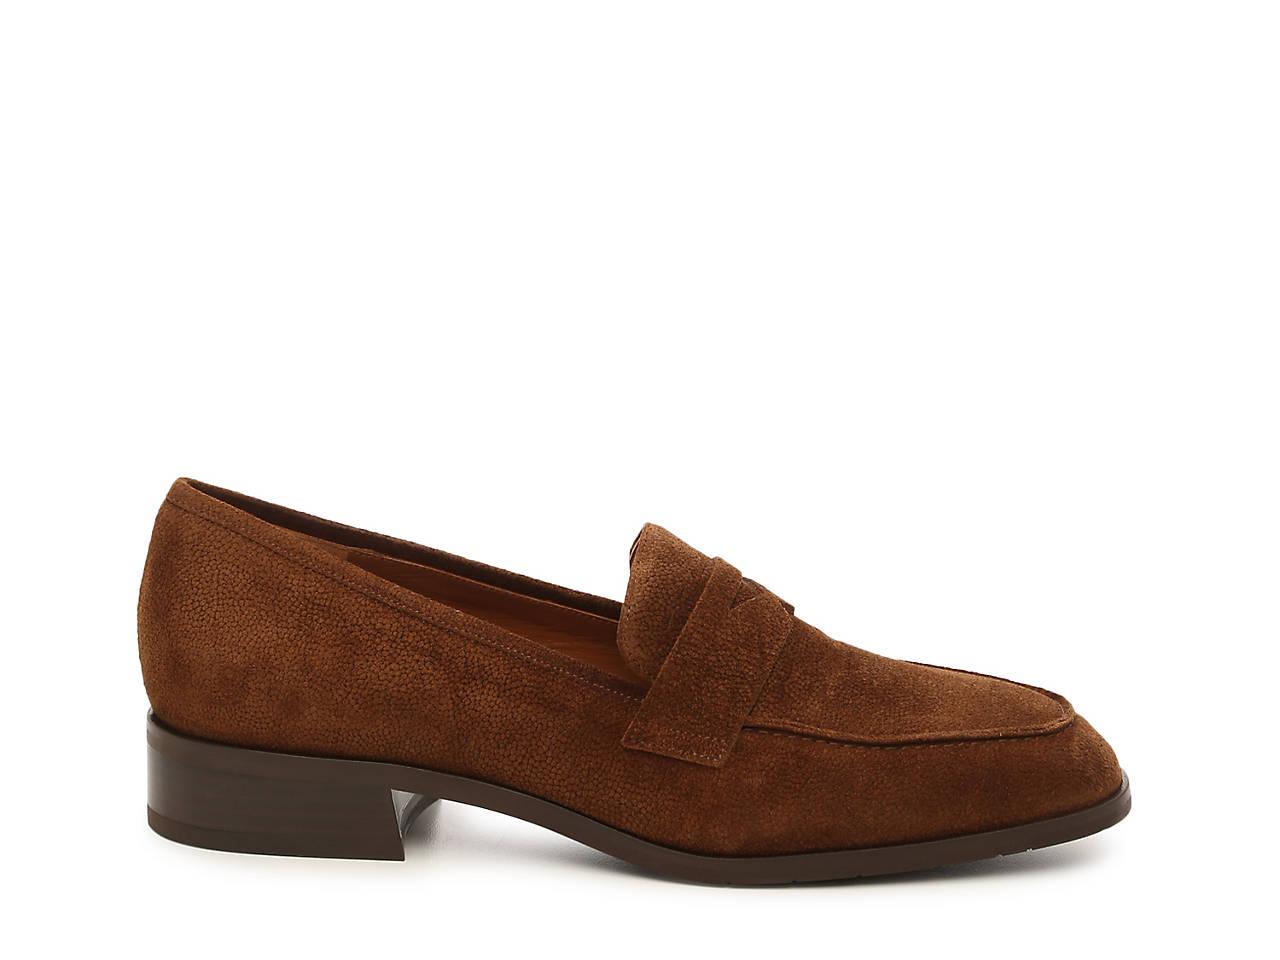 fca90d12403 Aquatalia Sharon Loafer Women s Shoes